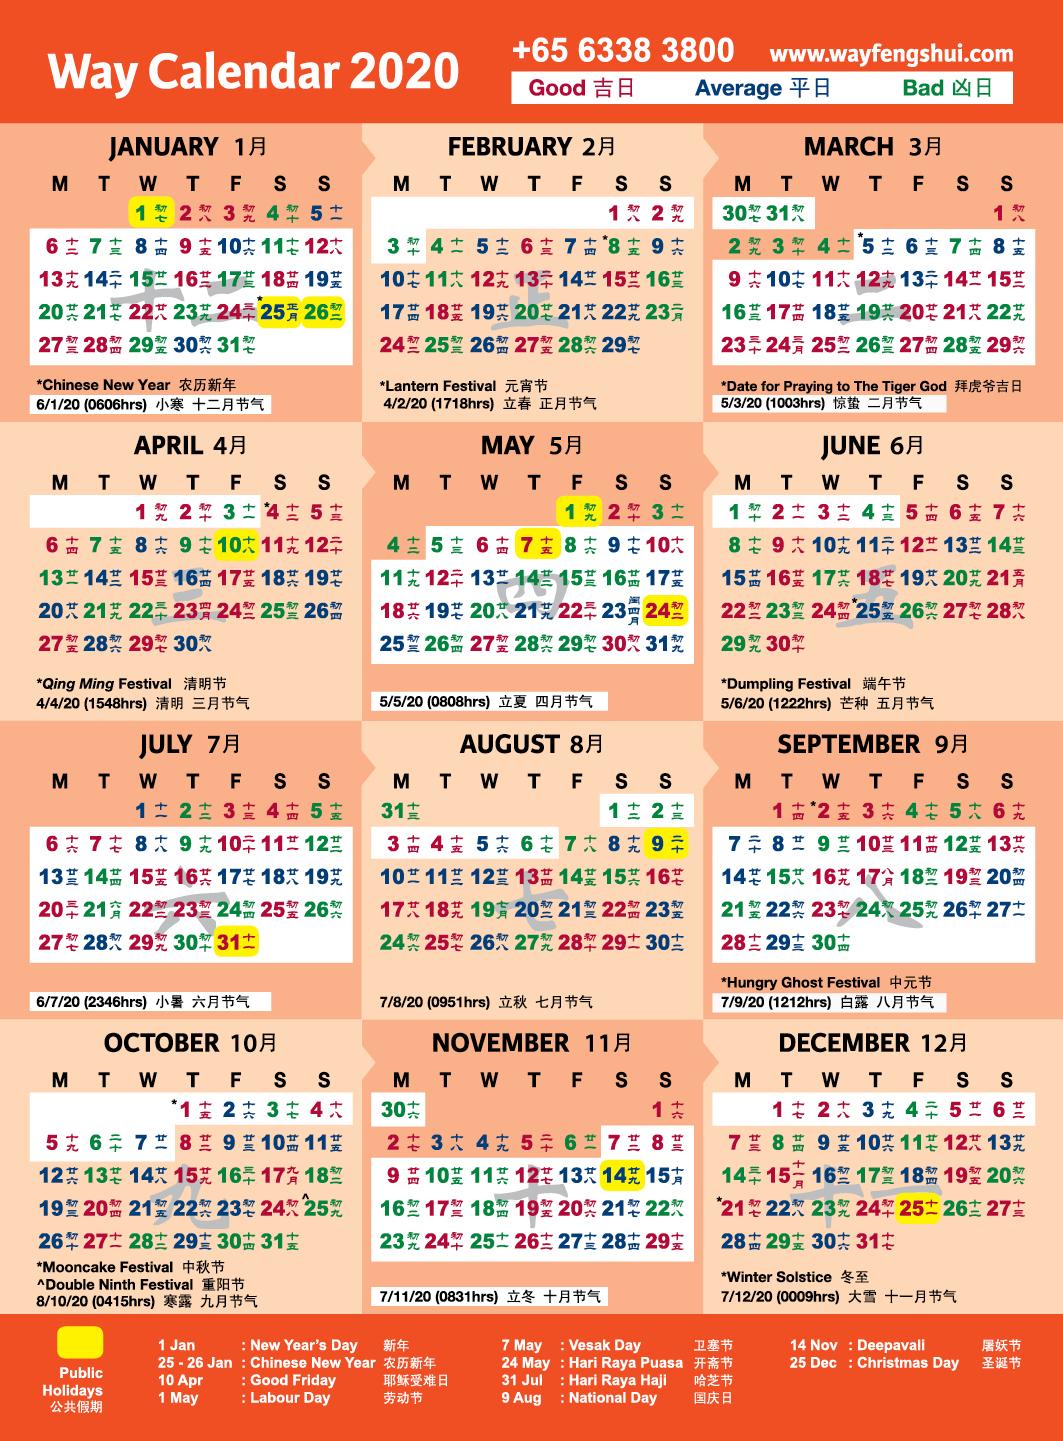 2020 Way Calendar - Feng Shui Master Singapore, Chinese